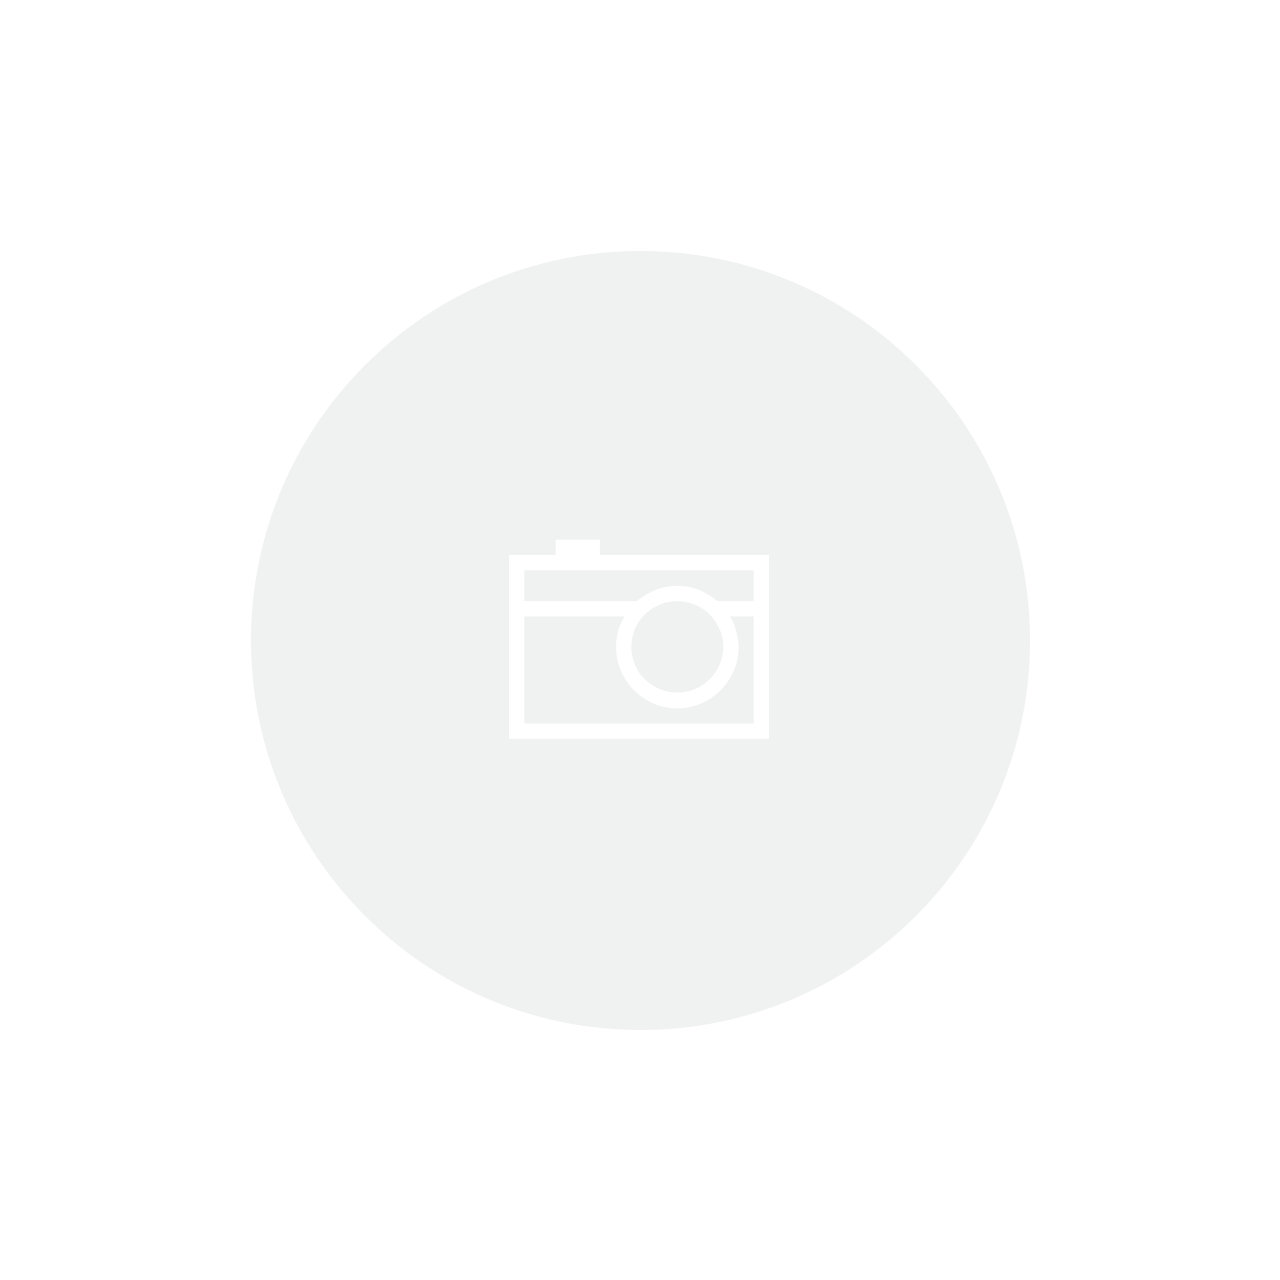 ESTABILIZADOR RAGTECH 2000VA SENSELASER 3515